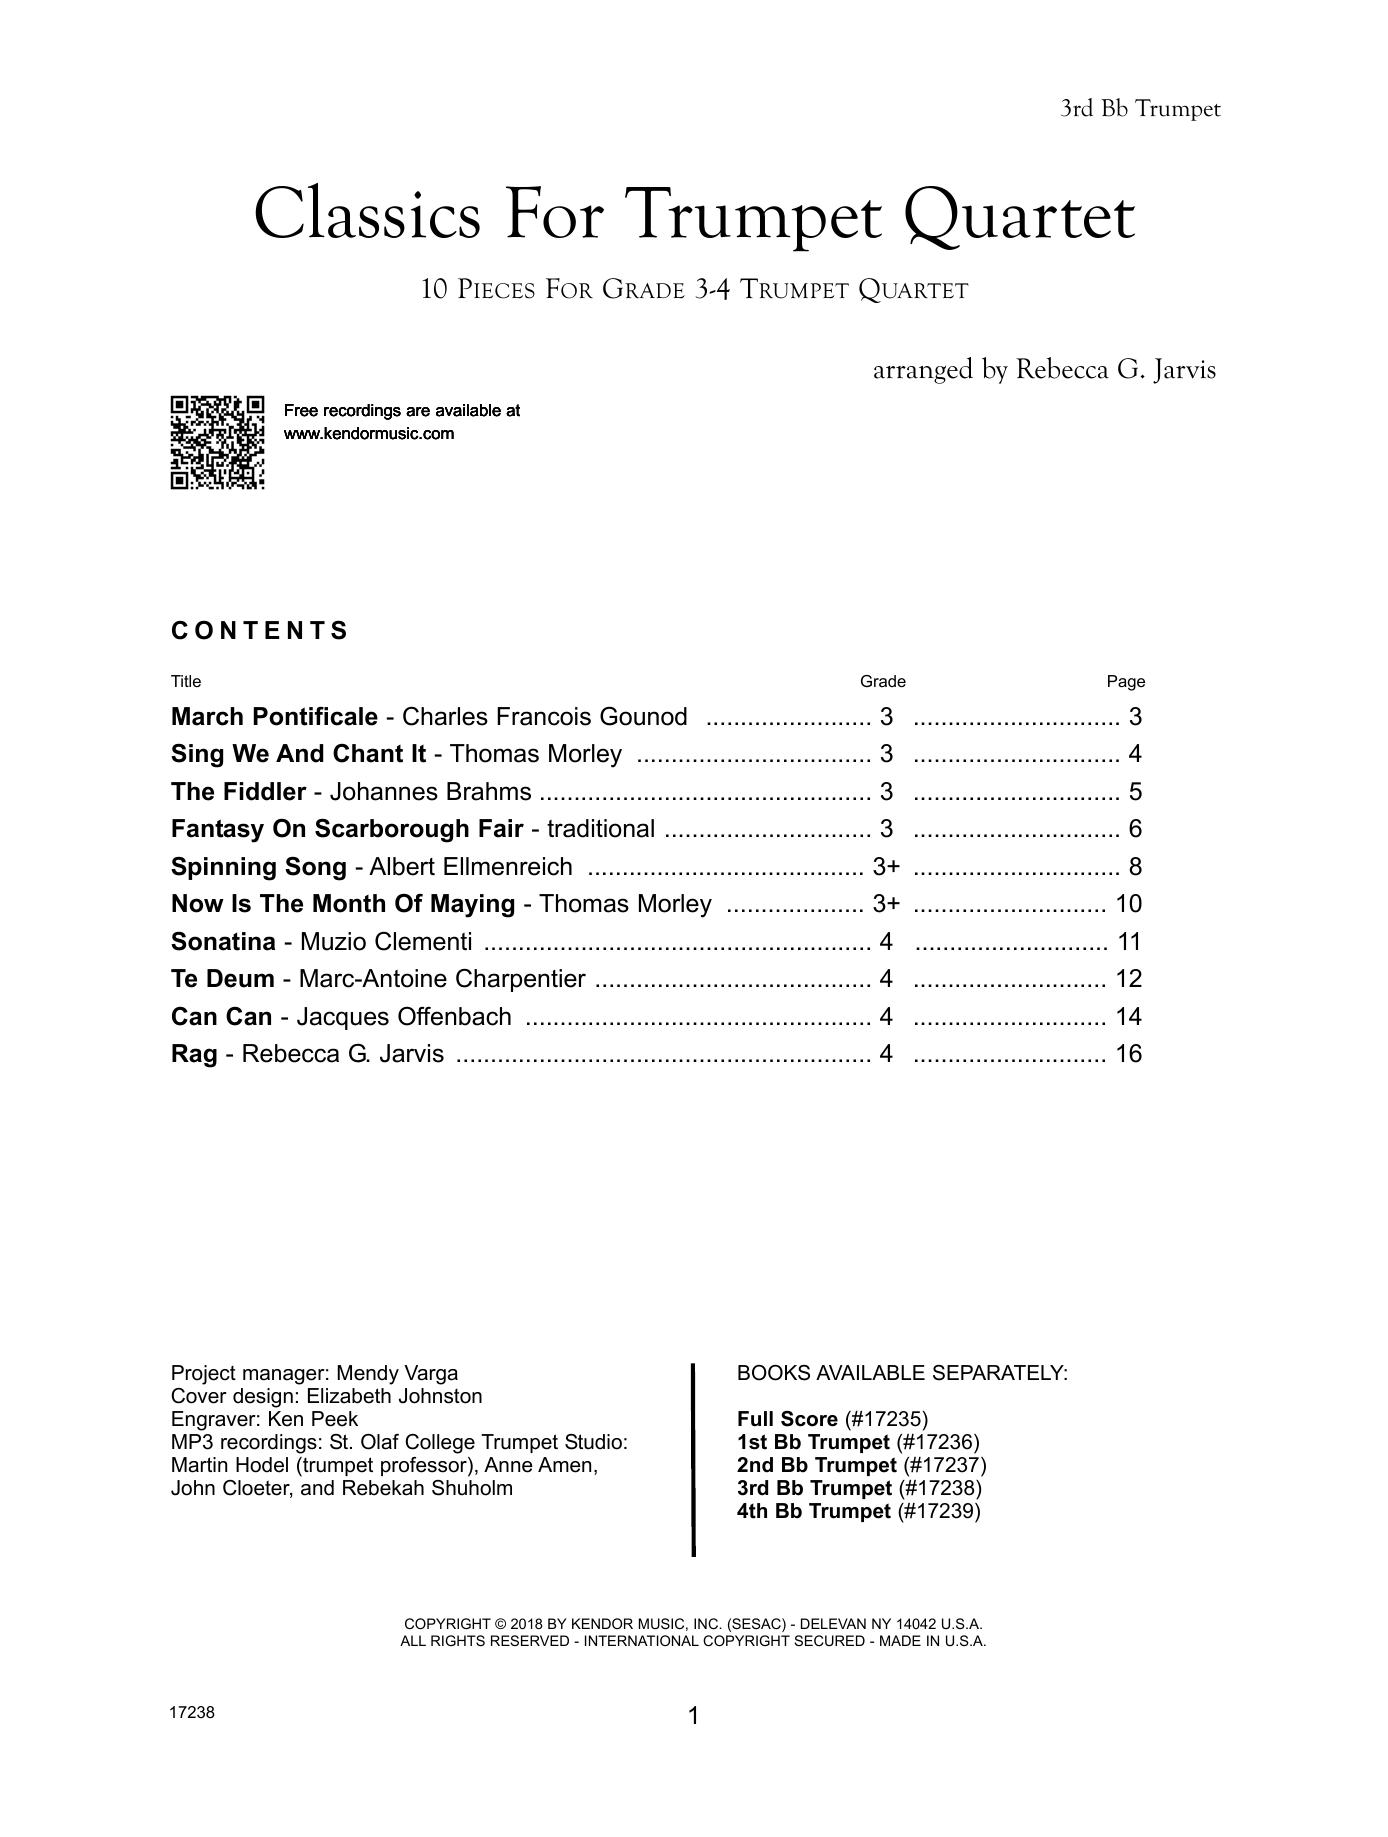 Classics For Trumpet Quartet - 3rd Trumpet Sheet Music